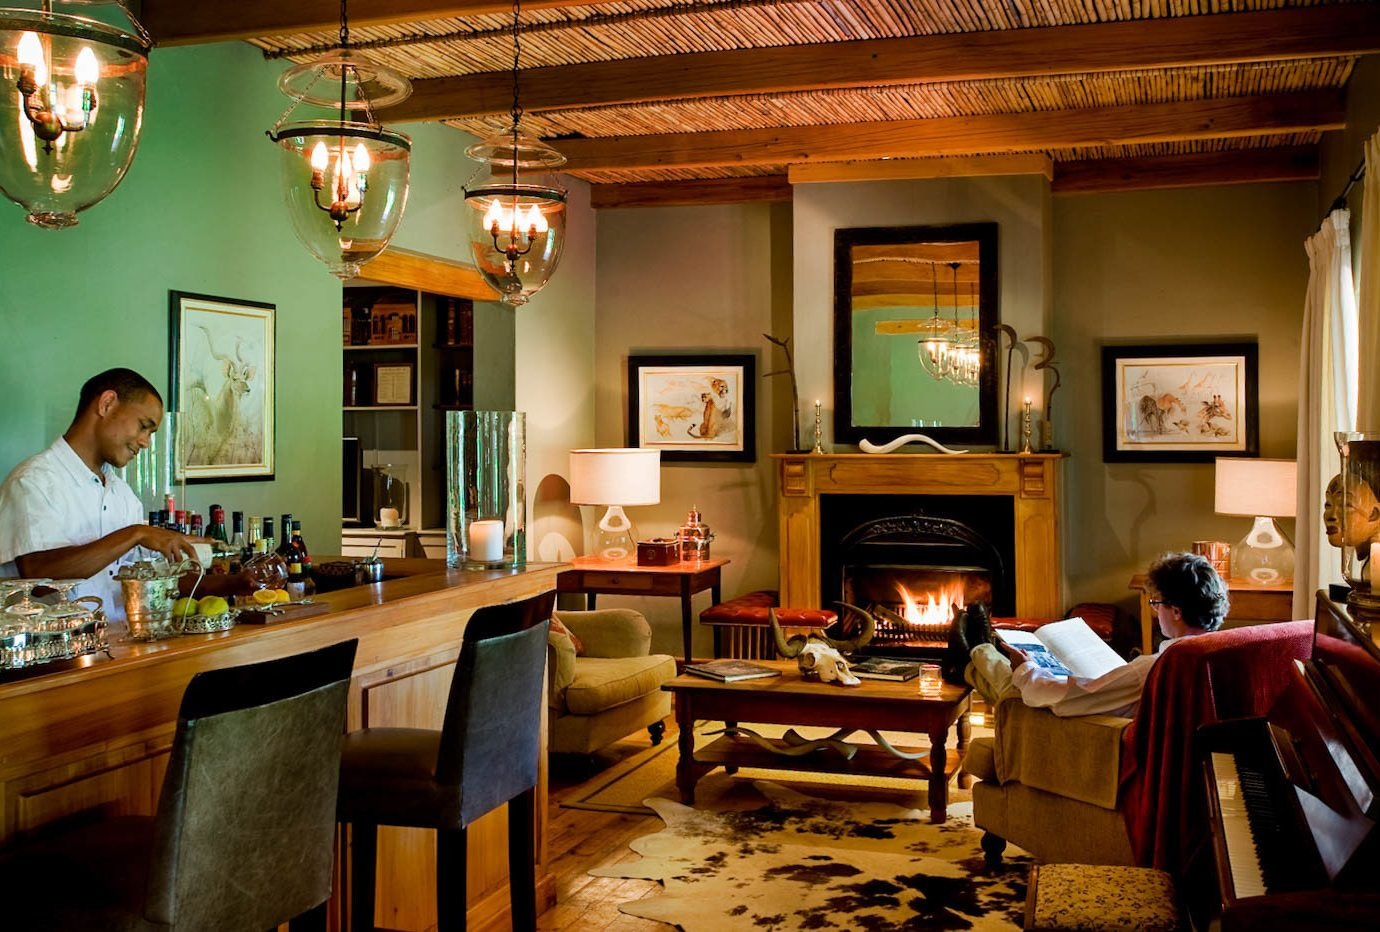 Budget indoor wall ceiling floor room home restaurant estate interior design living room recreation room Bar cottage furniture area